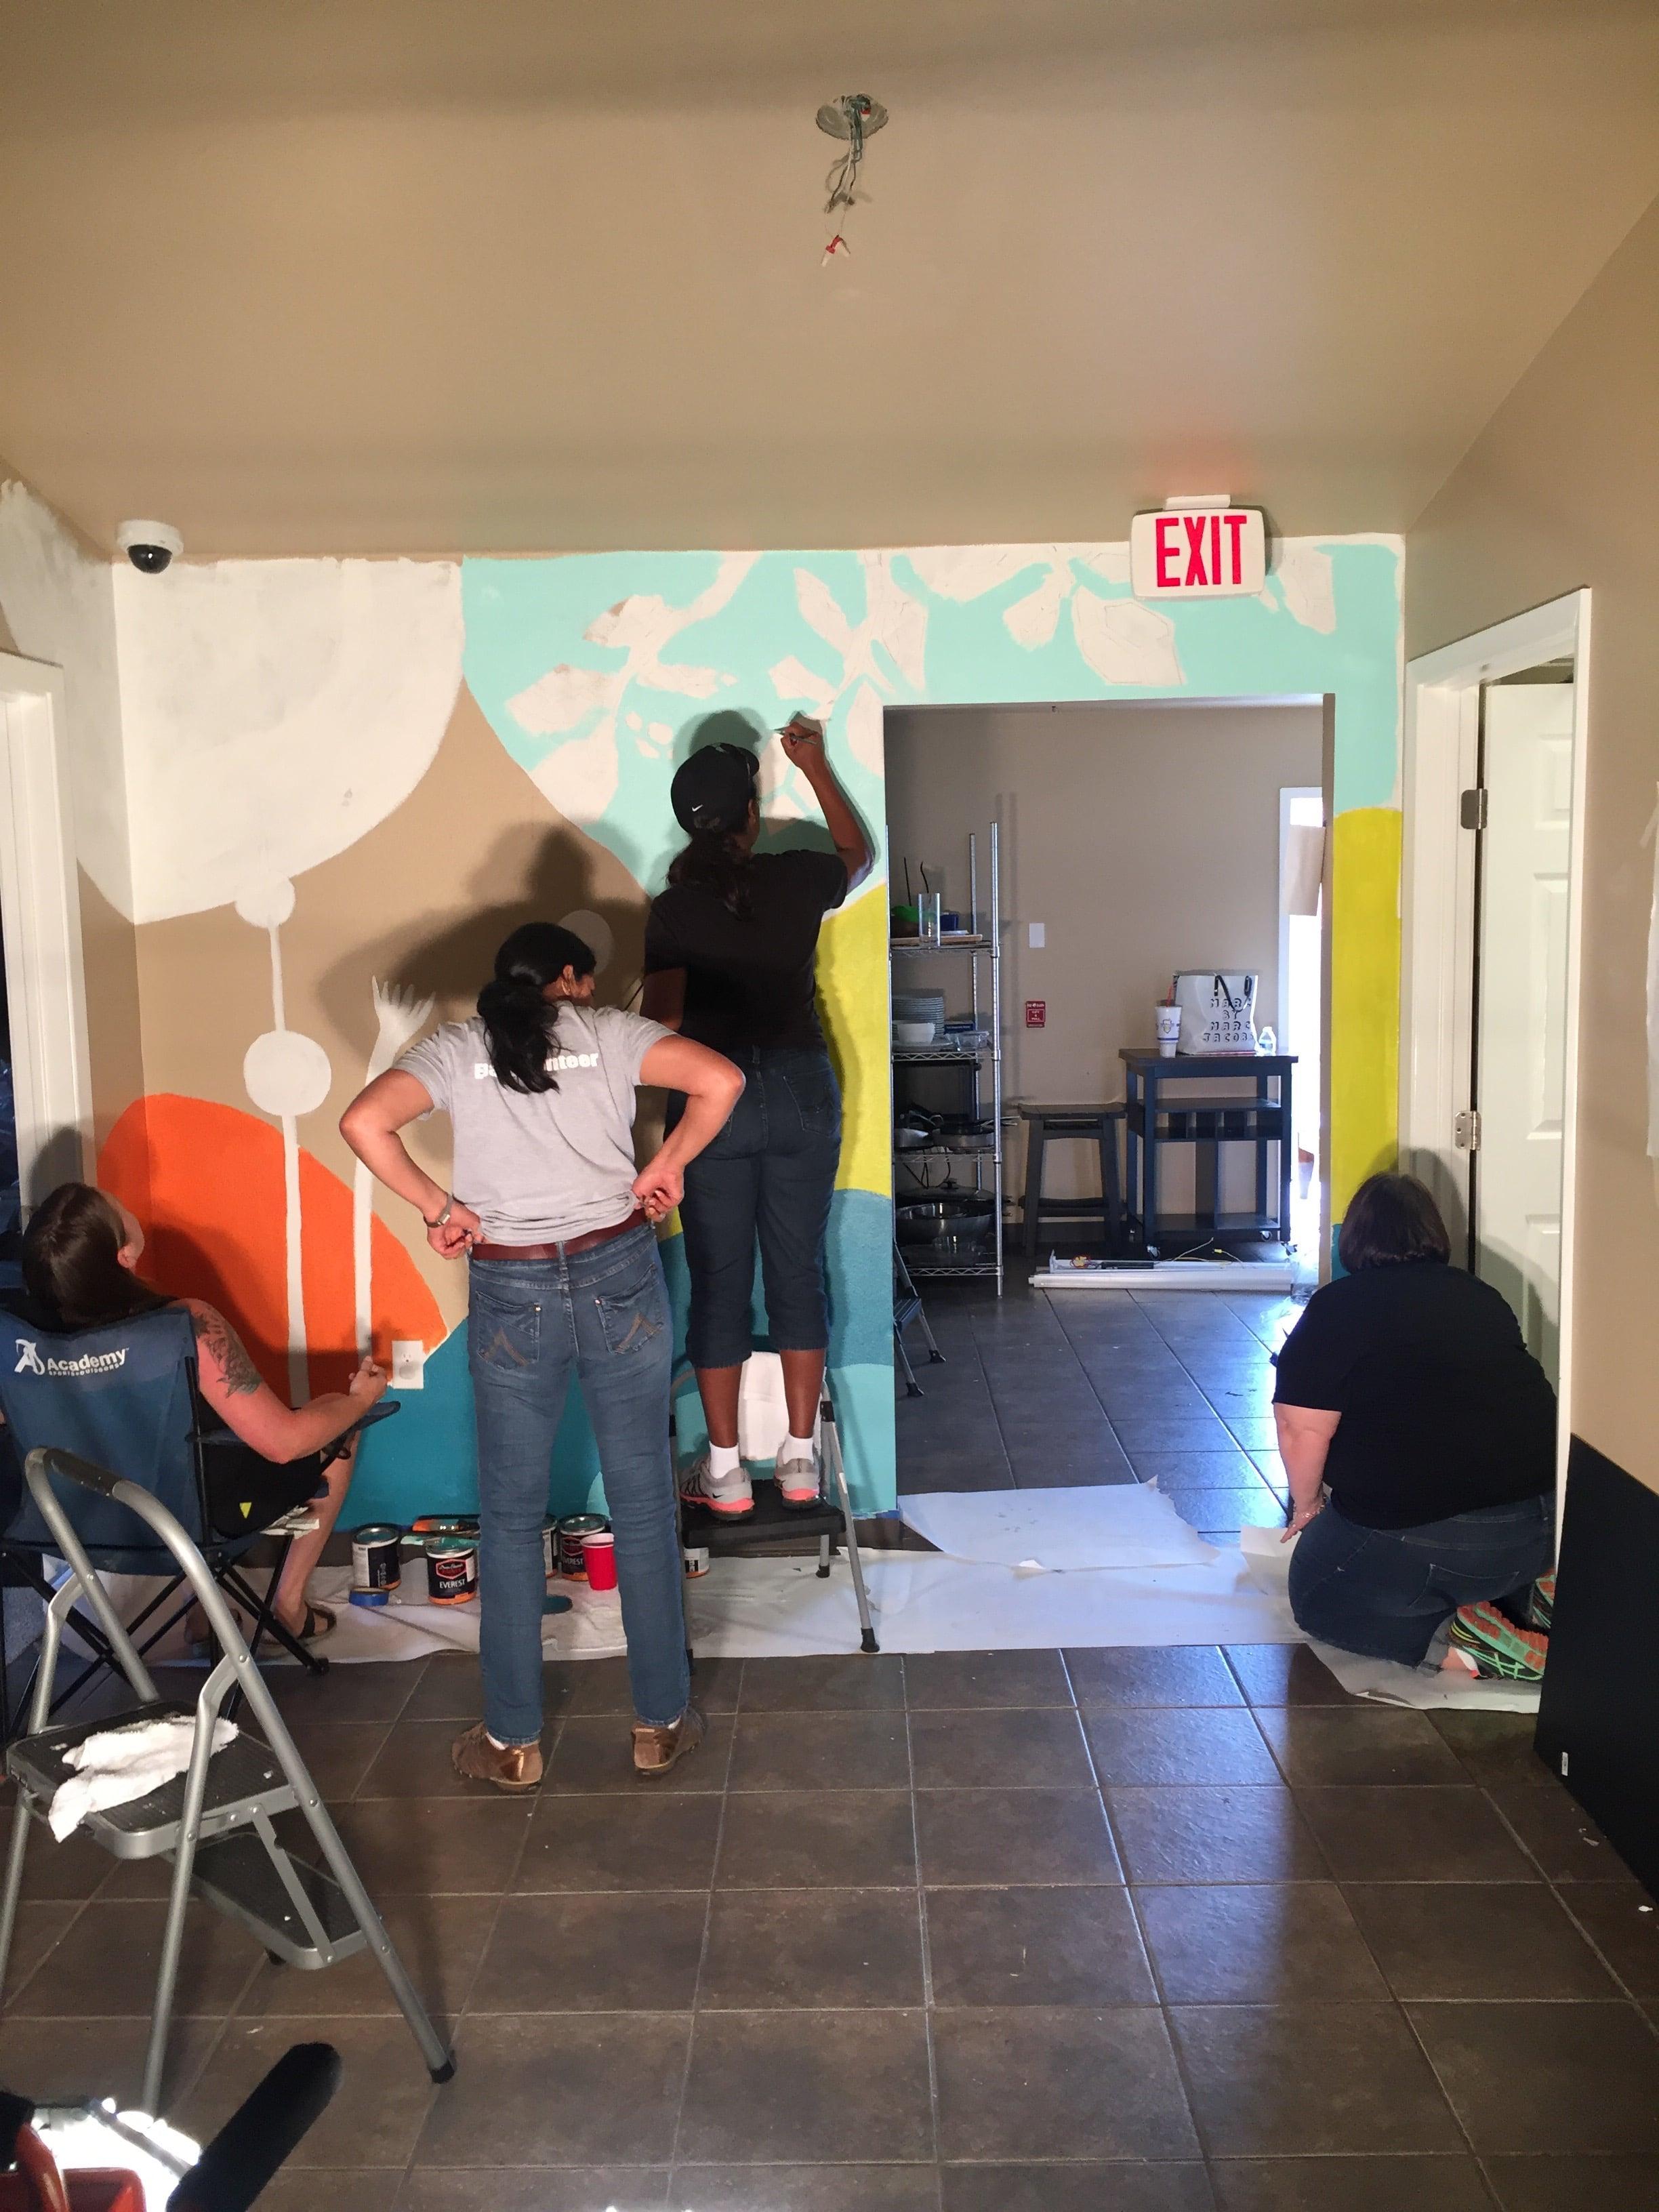 Ebay volunteers helping with the mural